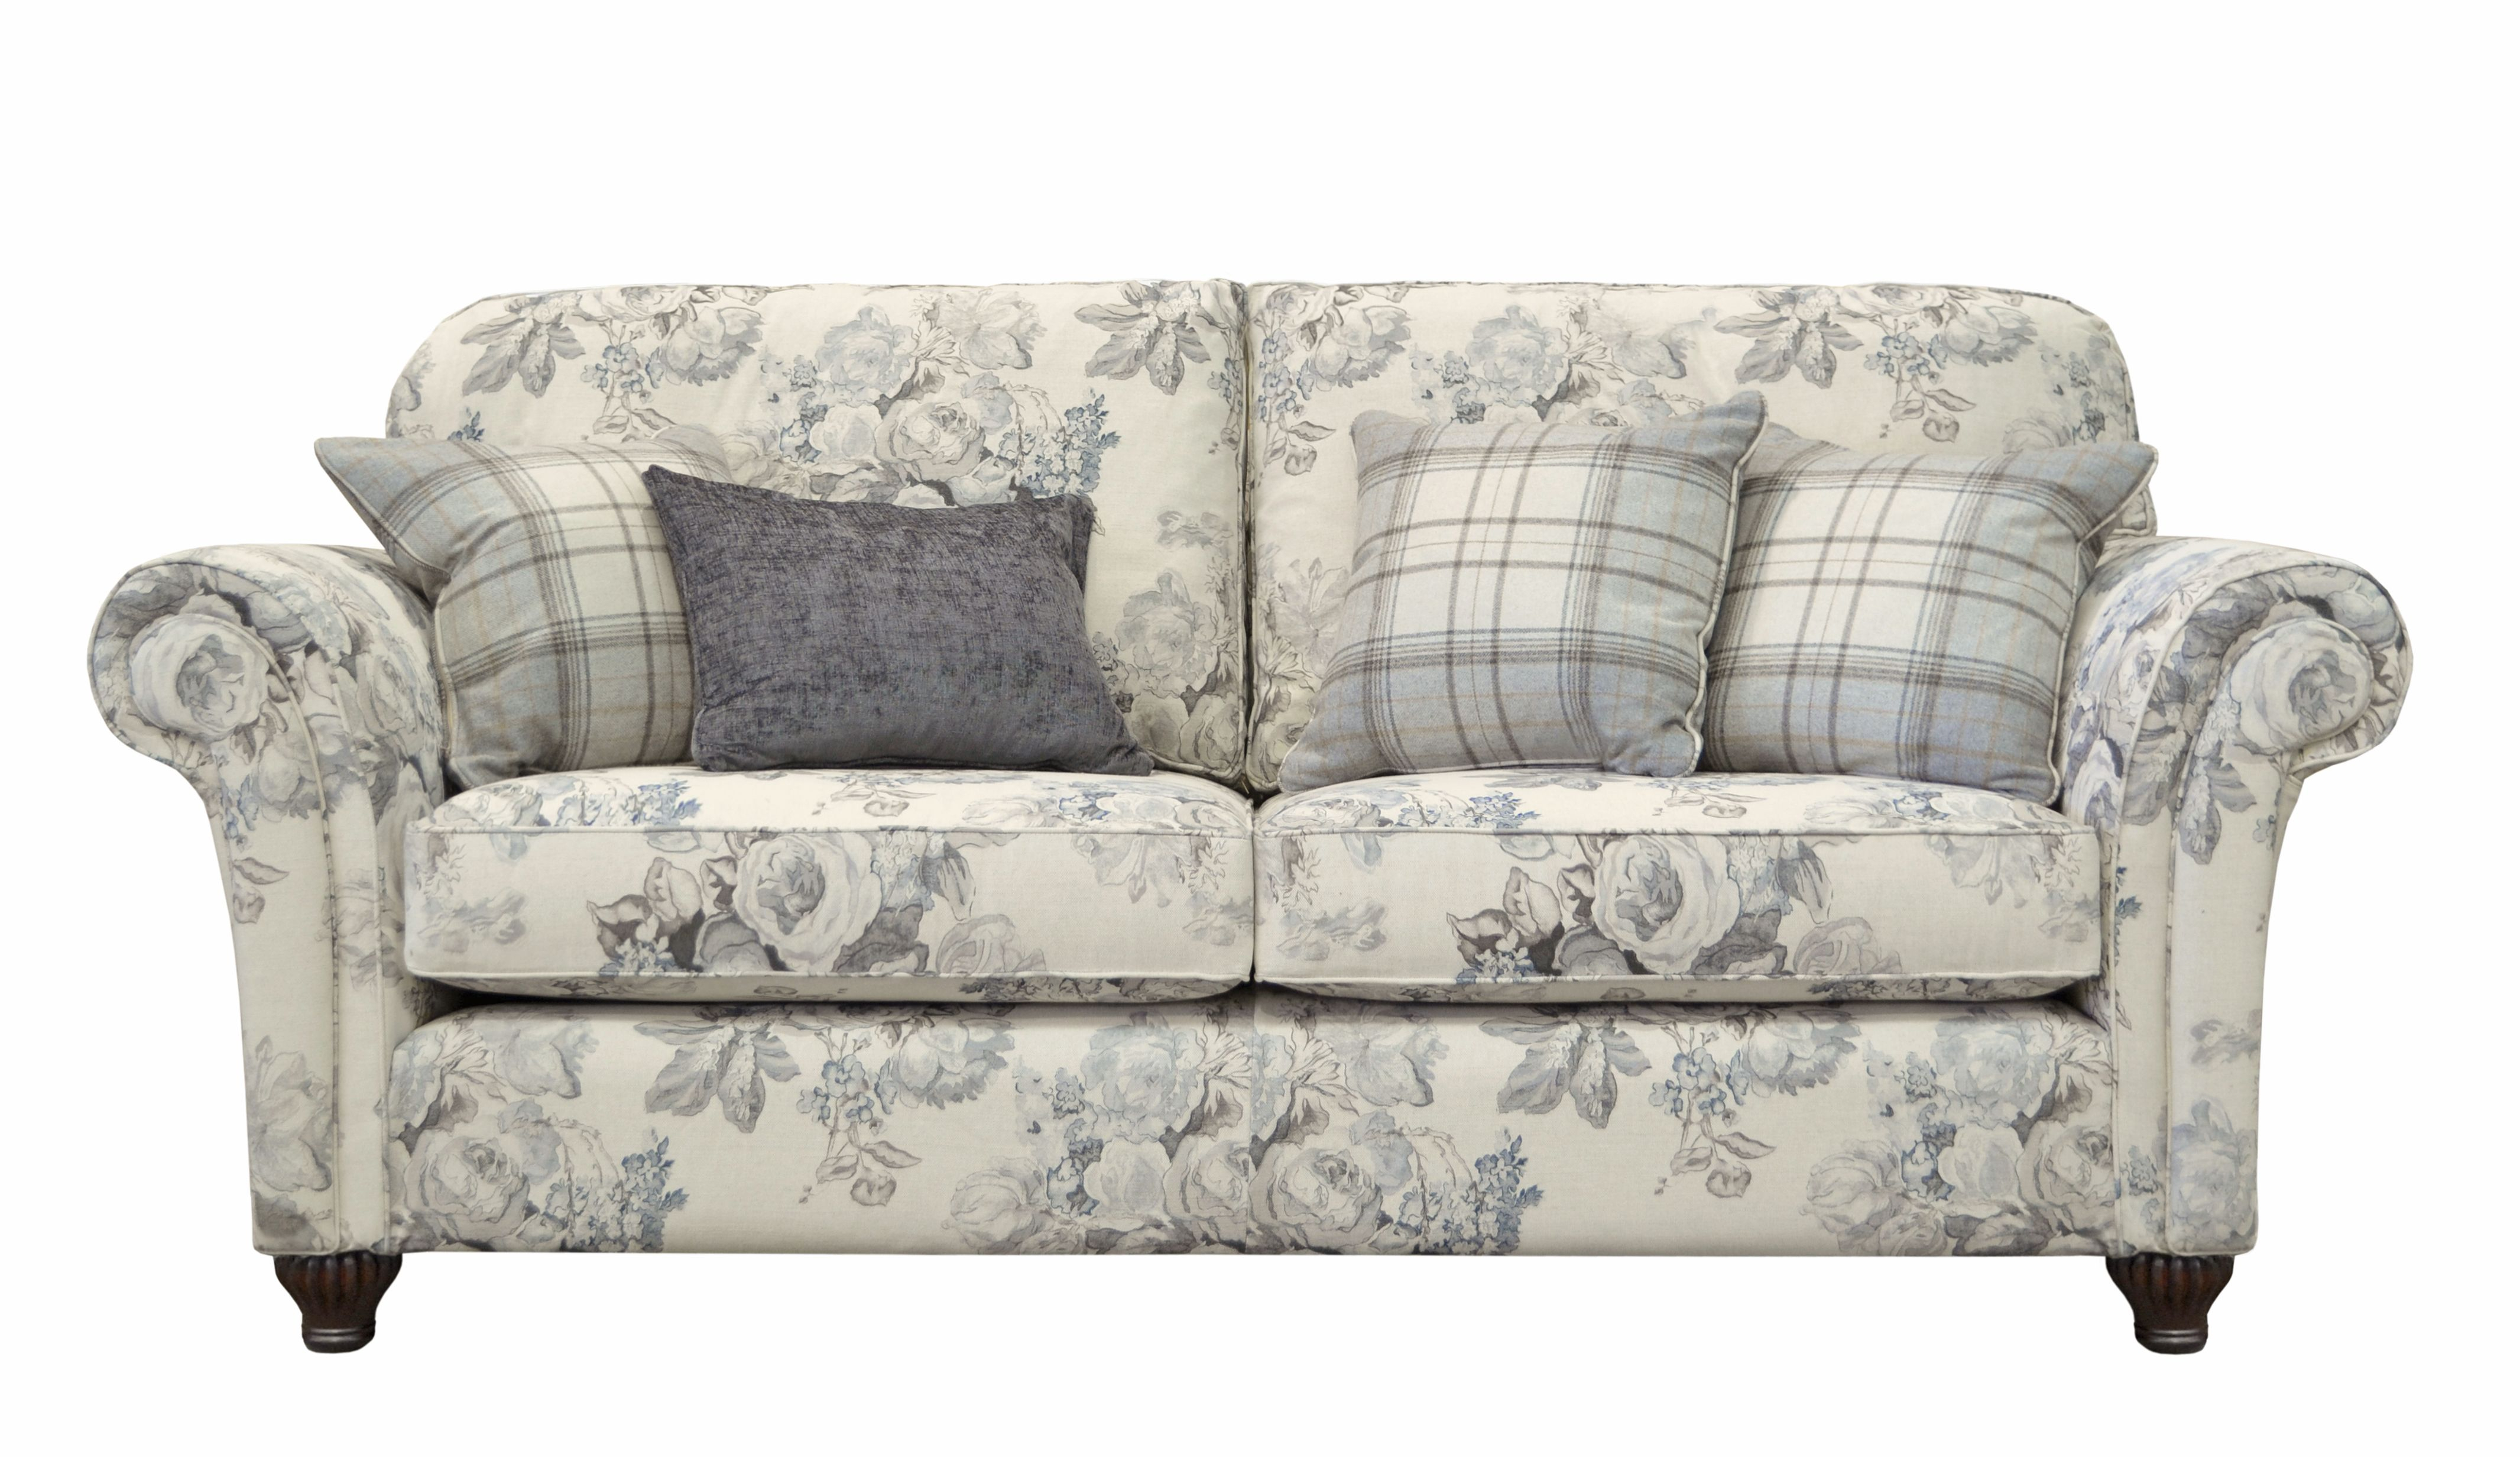 Pinholly Furney On I Love Interior Design! | Pinterest | Sofa Regarding Tate Arm Sofa Chairs (Image 14 of 25)